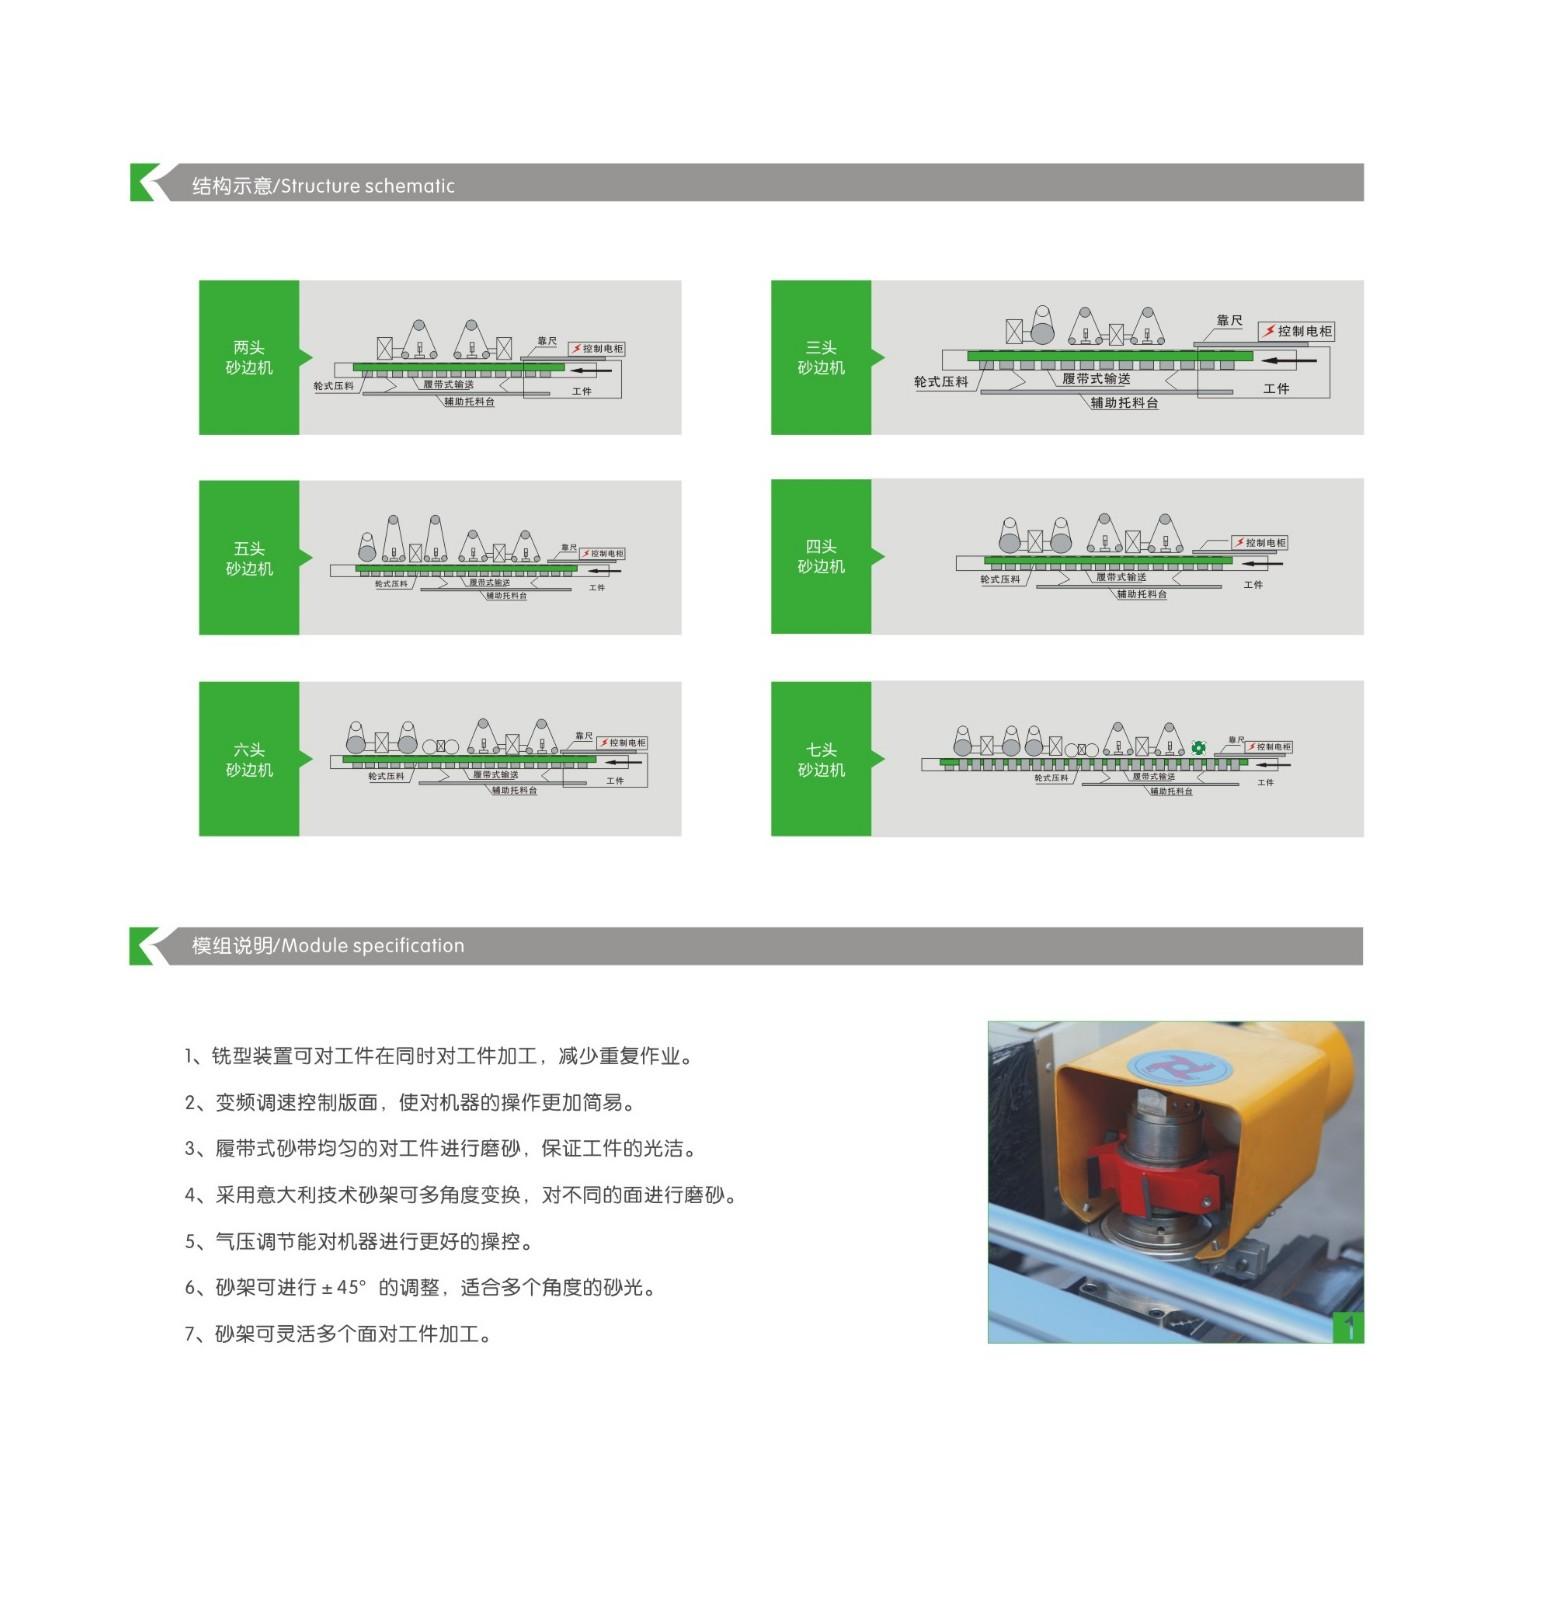 Muwei hard curve sliding table saw manufacturer for furniture-6